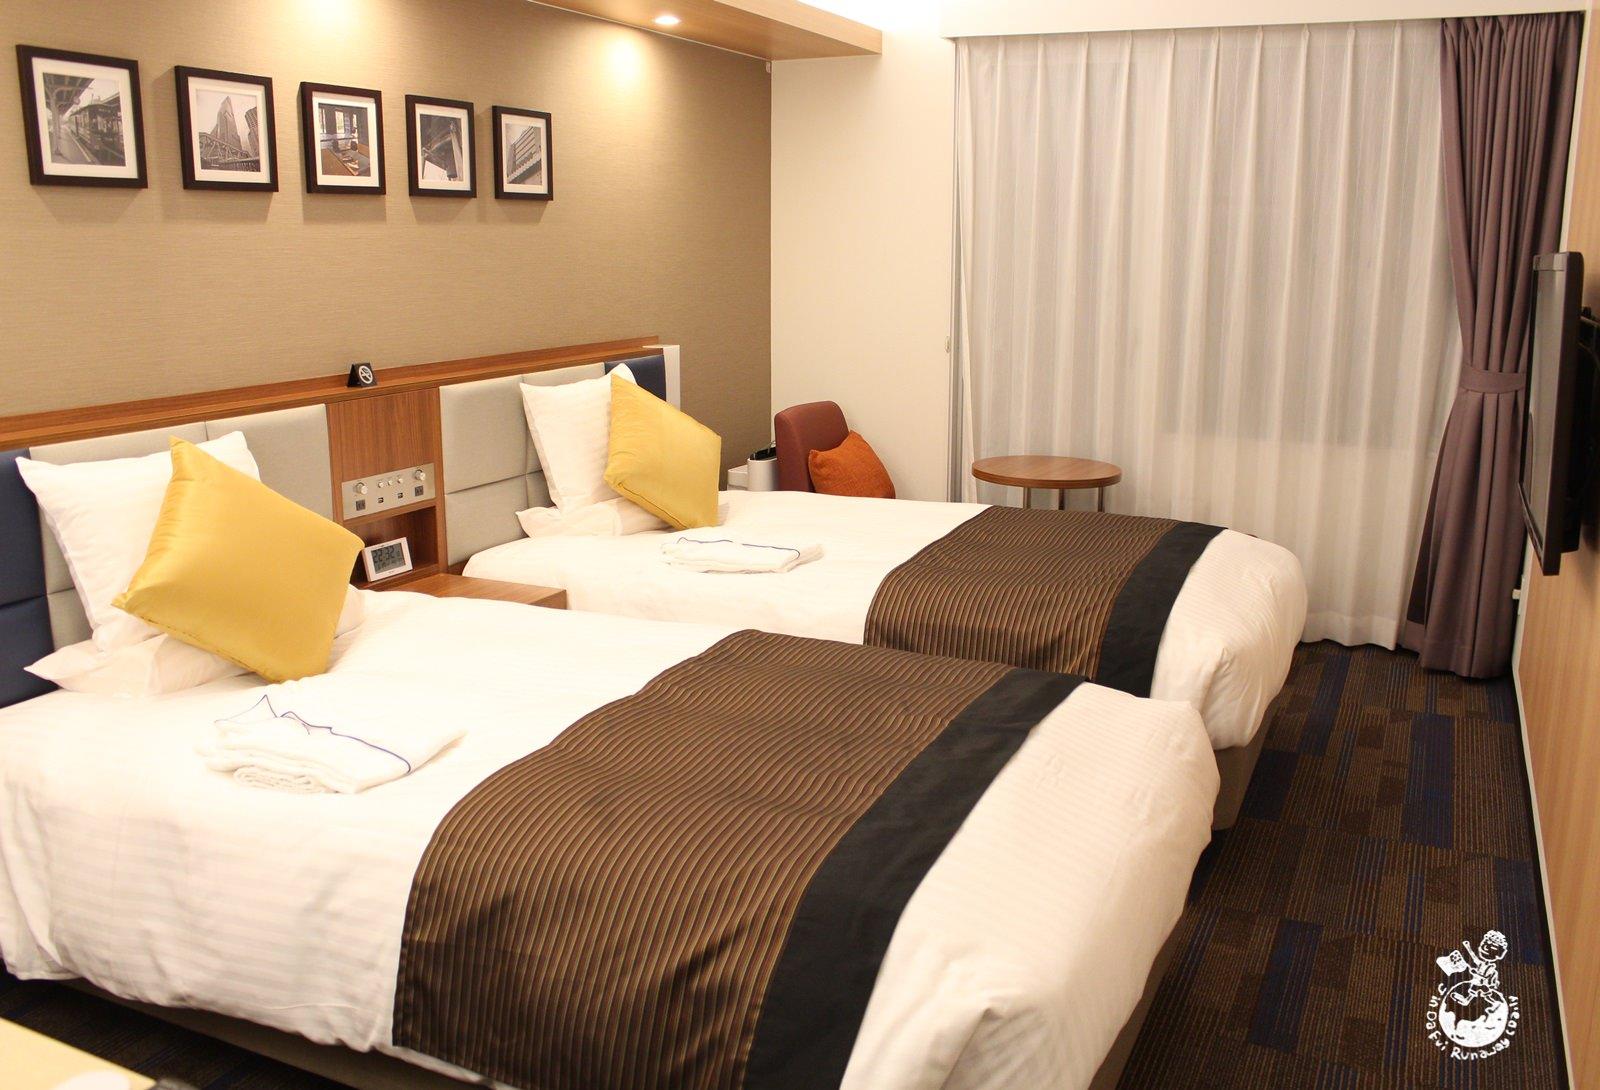 大阪住宿︳HOTEL MYSTAYS Shinsaibashi East 東心齋橋滿意酒店